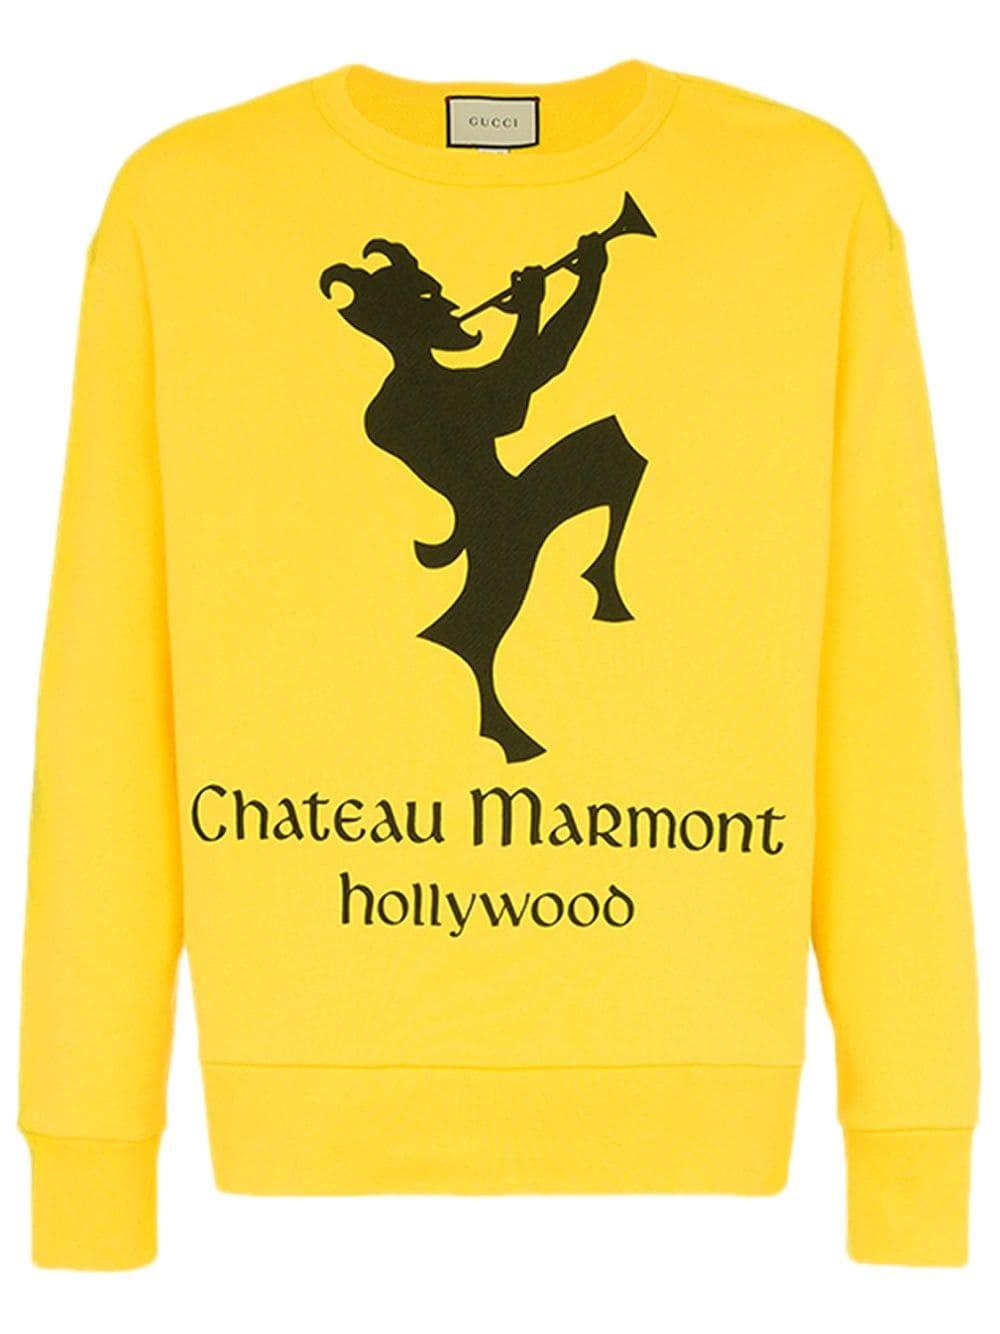 e0112fcf1e30a4 gucci CHATEAU MARMONT SWEATSHIRT available on montiboutique.com - 27234